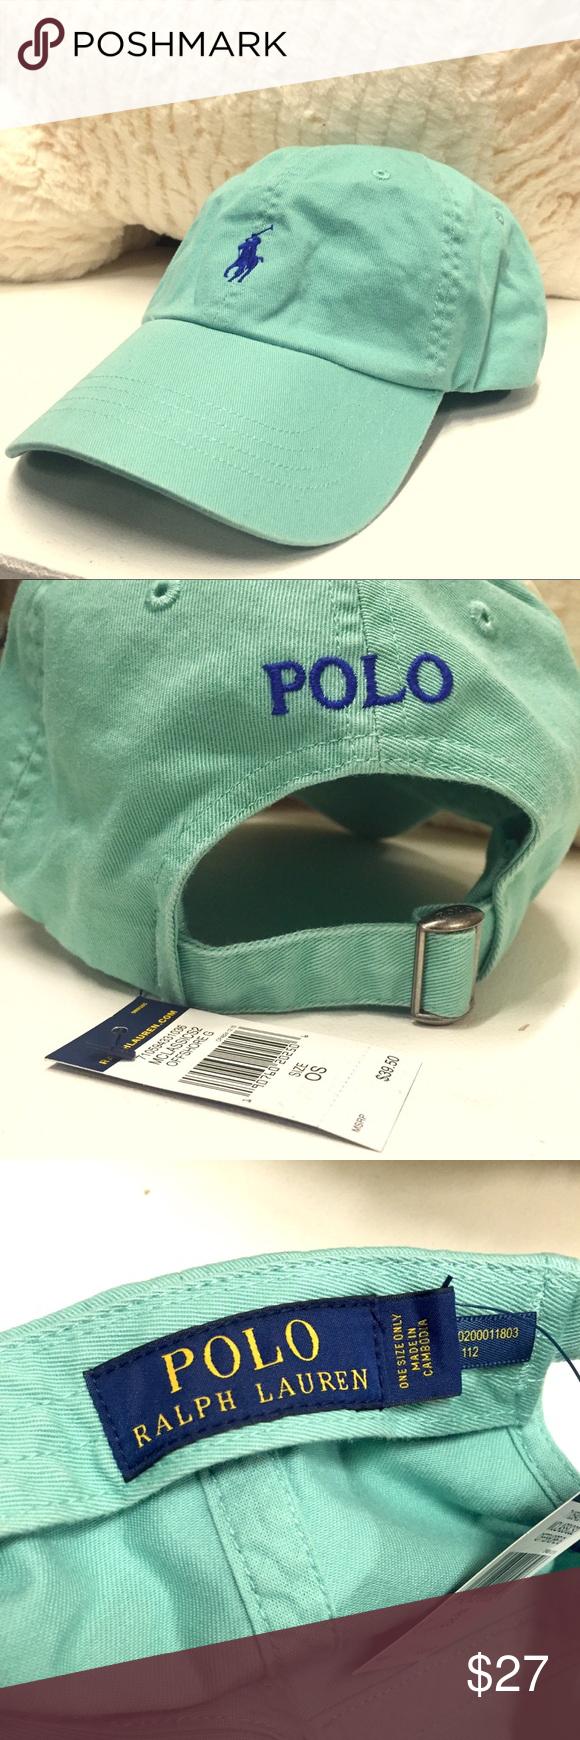 36a1f9dfb6c Green Polo Ralph Lauren Baseball Cap (UNISEX) Gorgeous mint green! Fits men  and women since it has an adjustable strap. 6-panel hat.